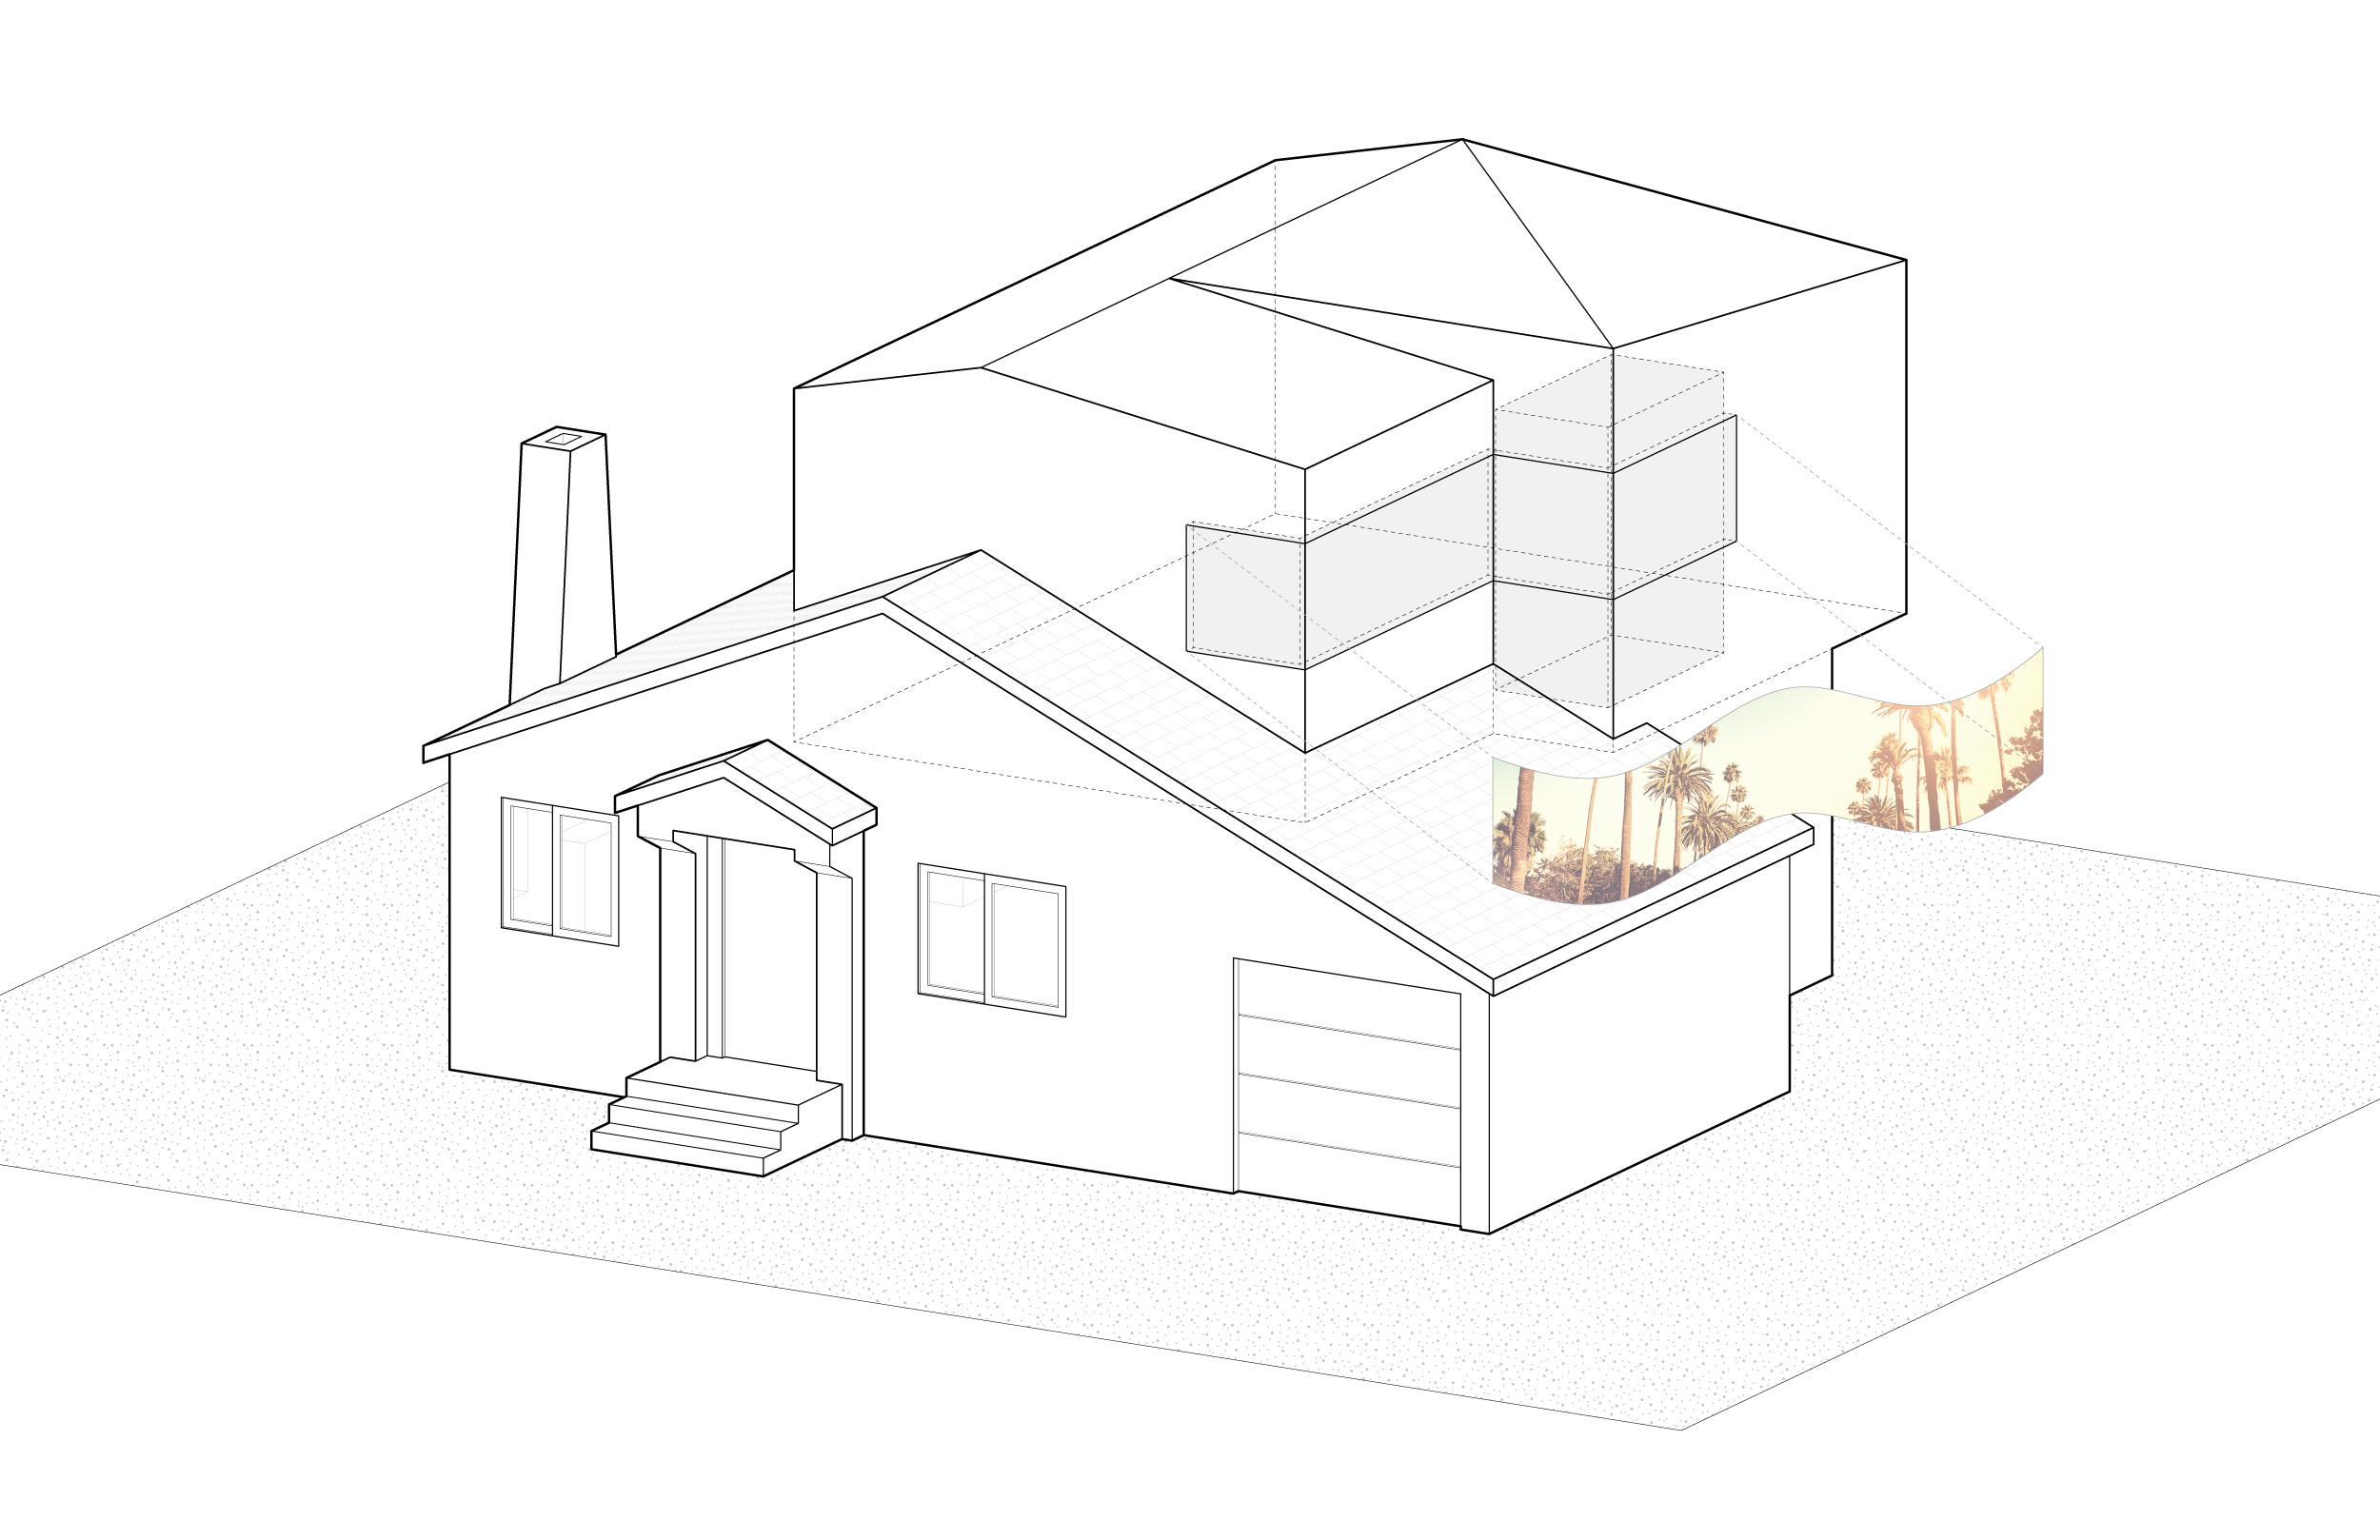 Rosewood-House_Diagram_06.jpg